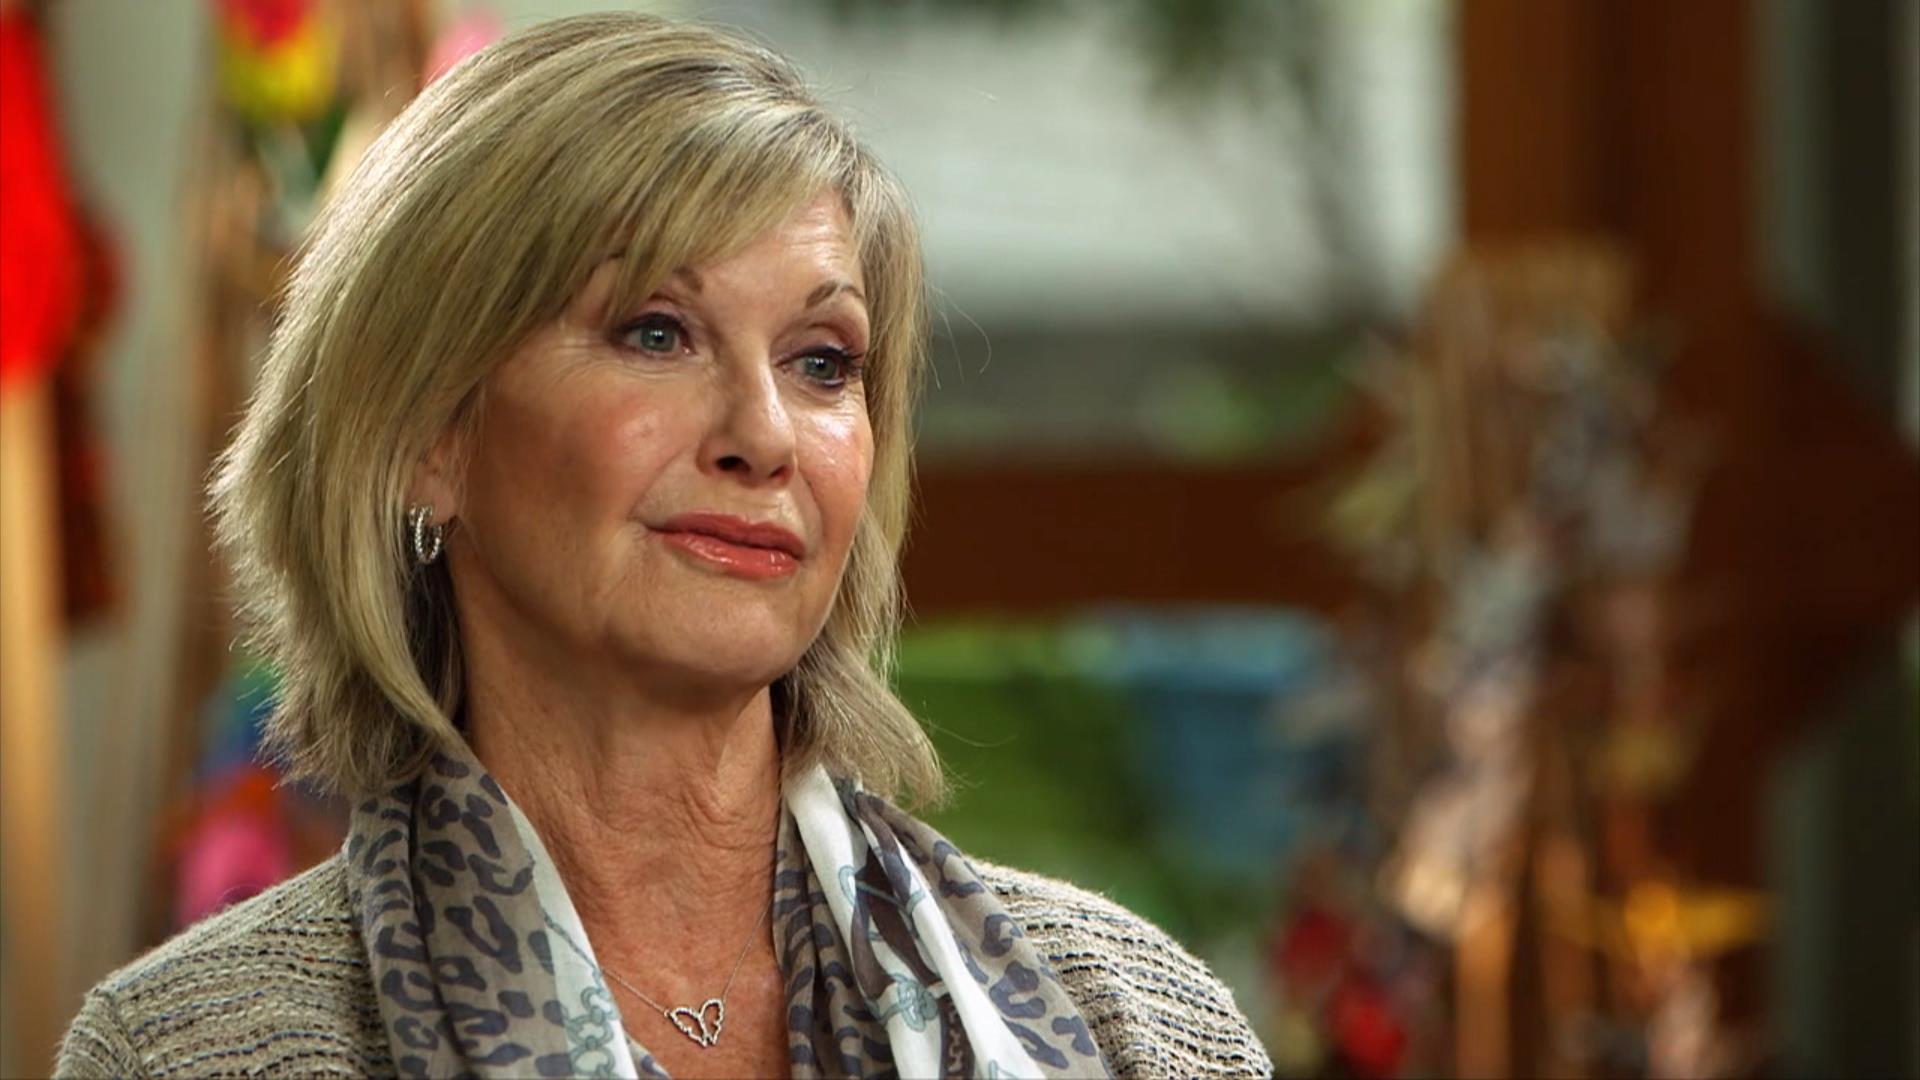 Olivia Newton John Reveals Secret Cancer Diagnosis In New Interview